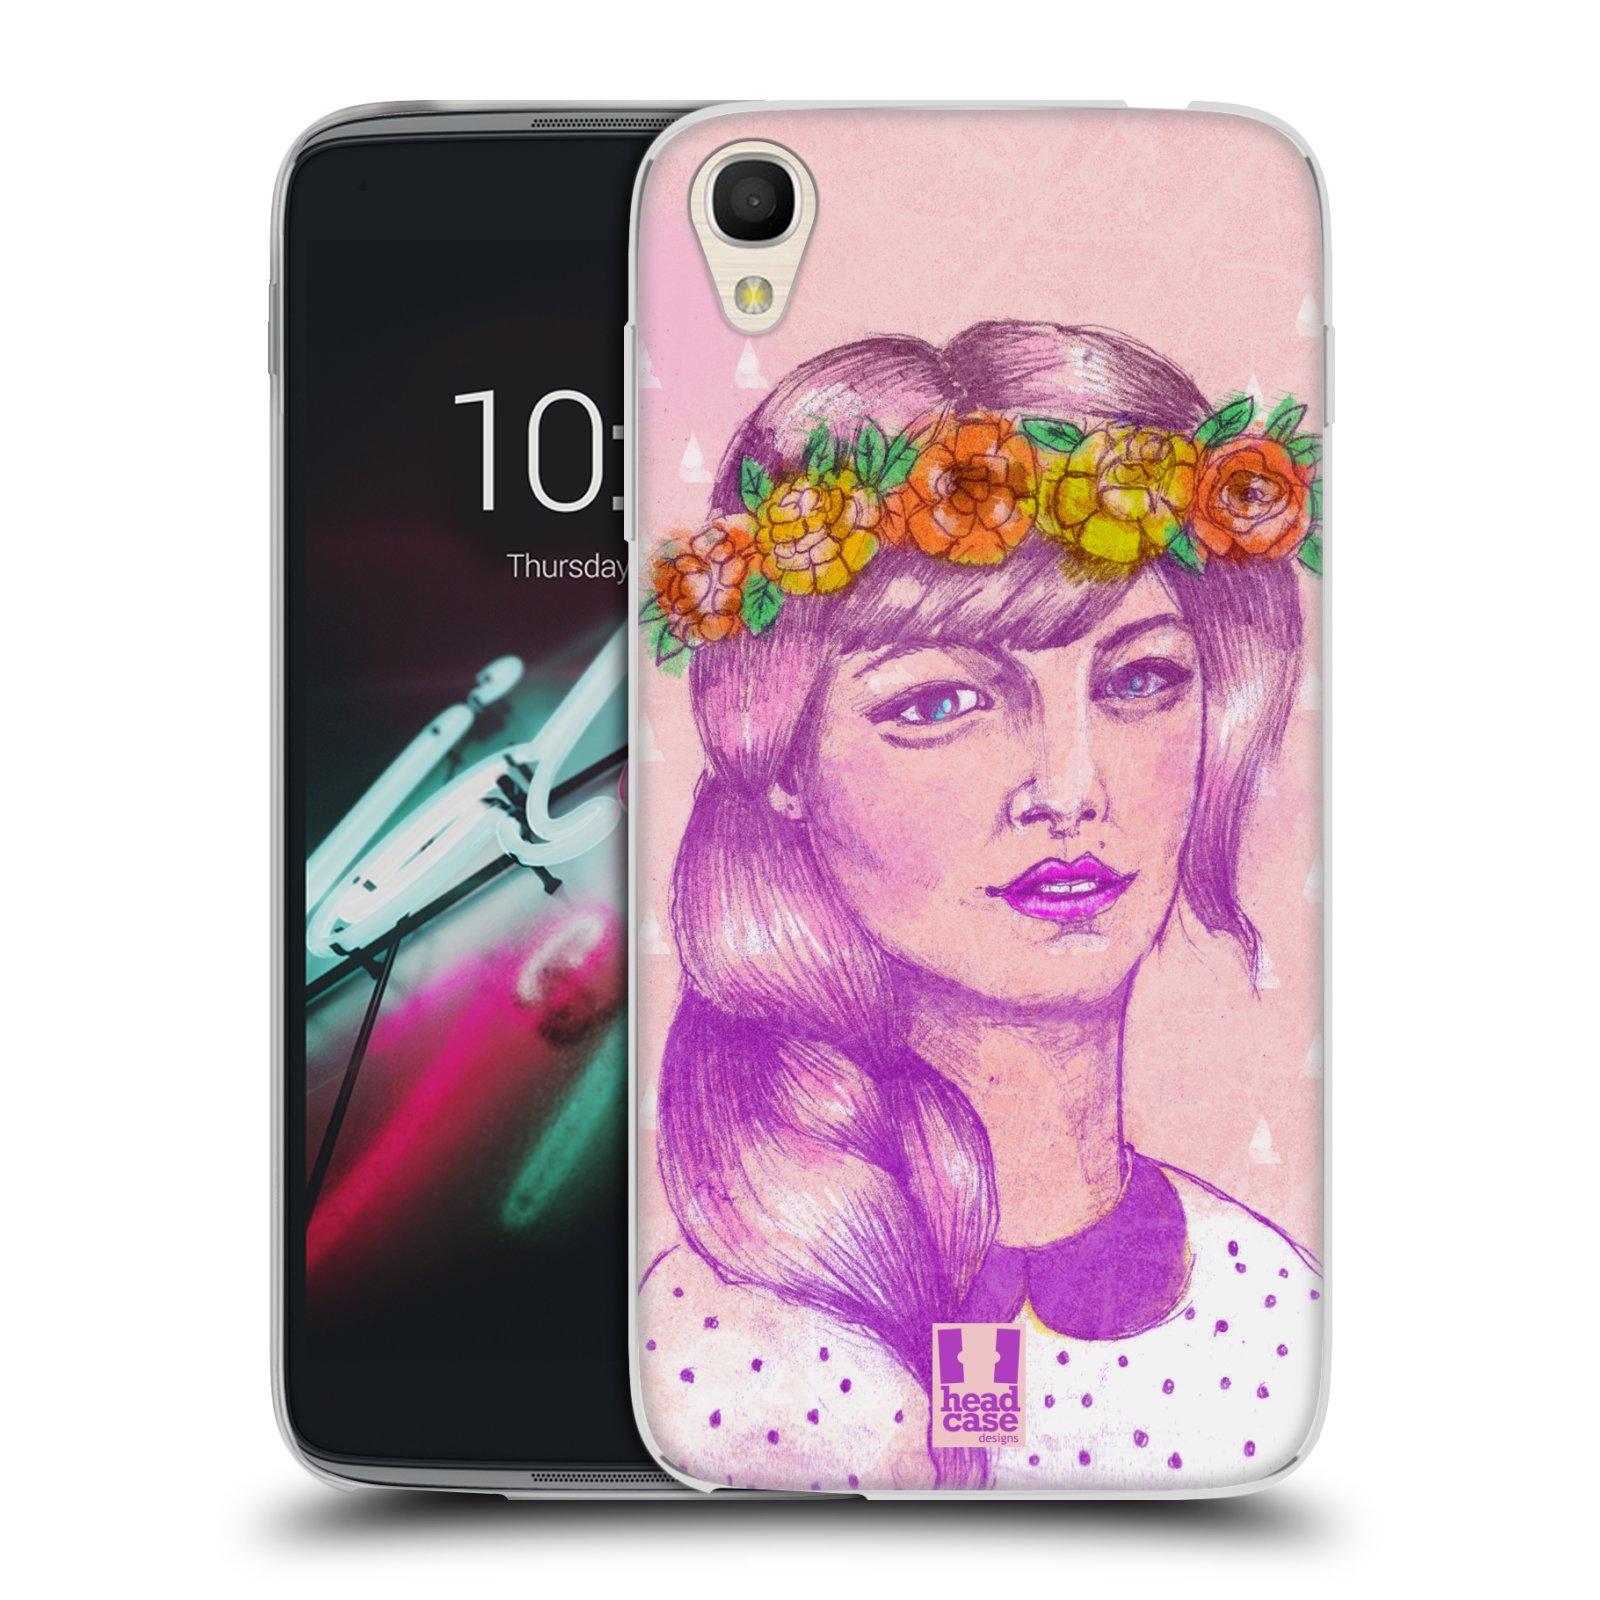 HEAD CASE silikonový obal na mobil Alcatel Idol 3 OT-6039Y (4.7) vzor Dívka dlouhé květinové vlasy KRÁSA